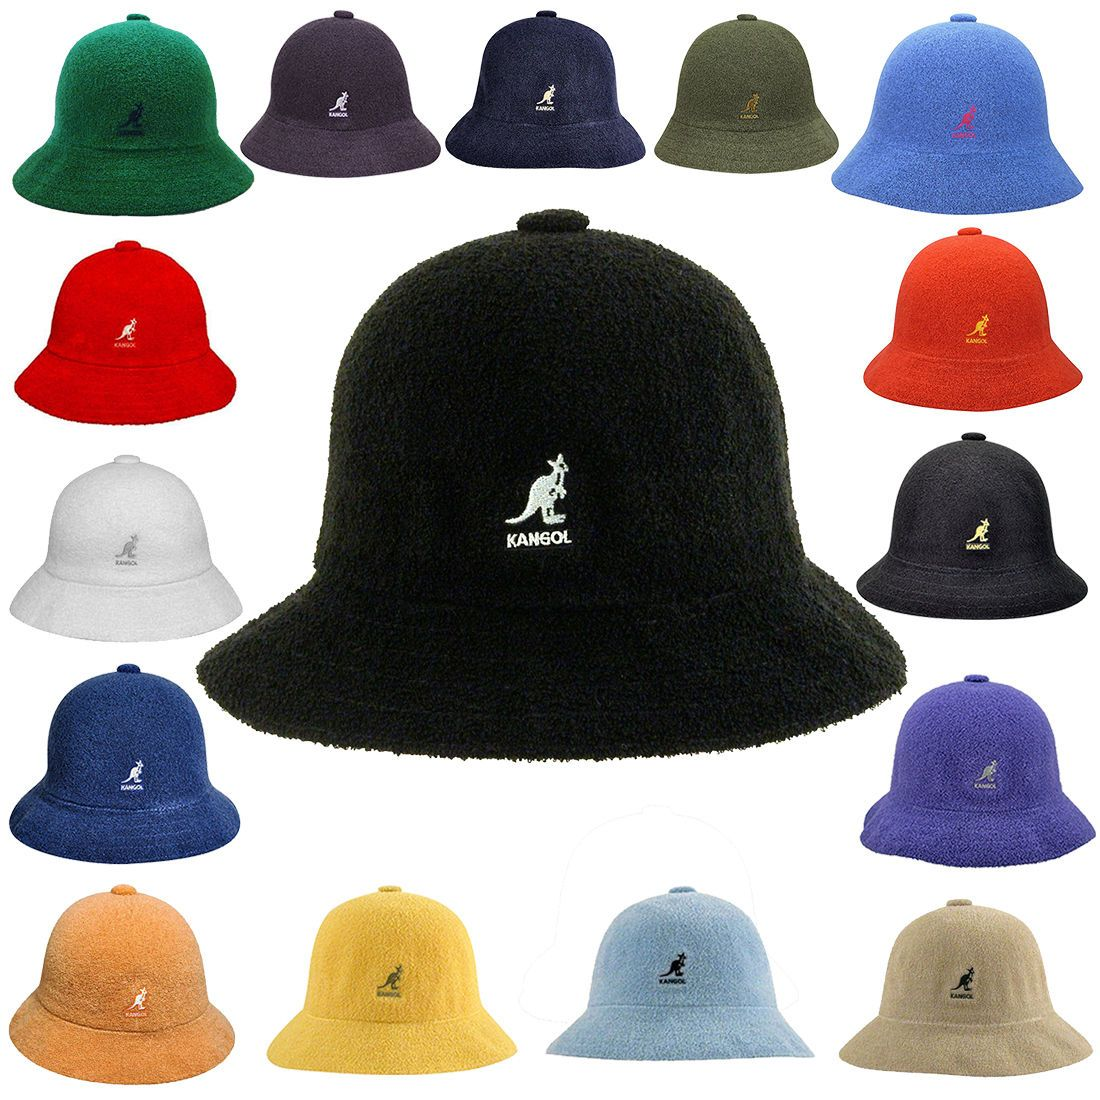 New100 Authentic Kangol Bermuda Casual Bucket Cap Hat 0397bc Sizes S M L Xl Xxl Kangol Hats For Men Kangol Hats